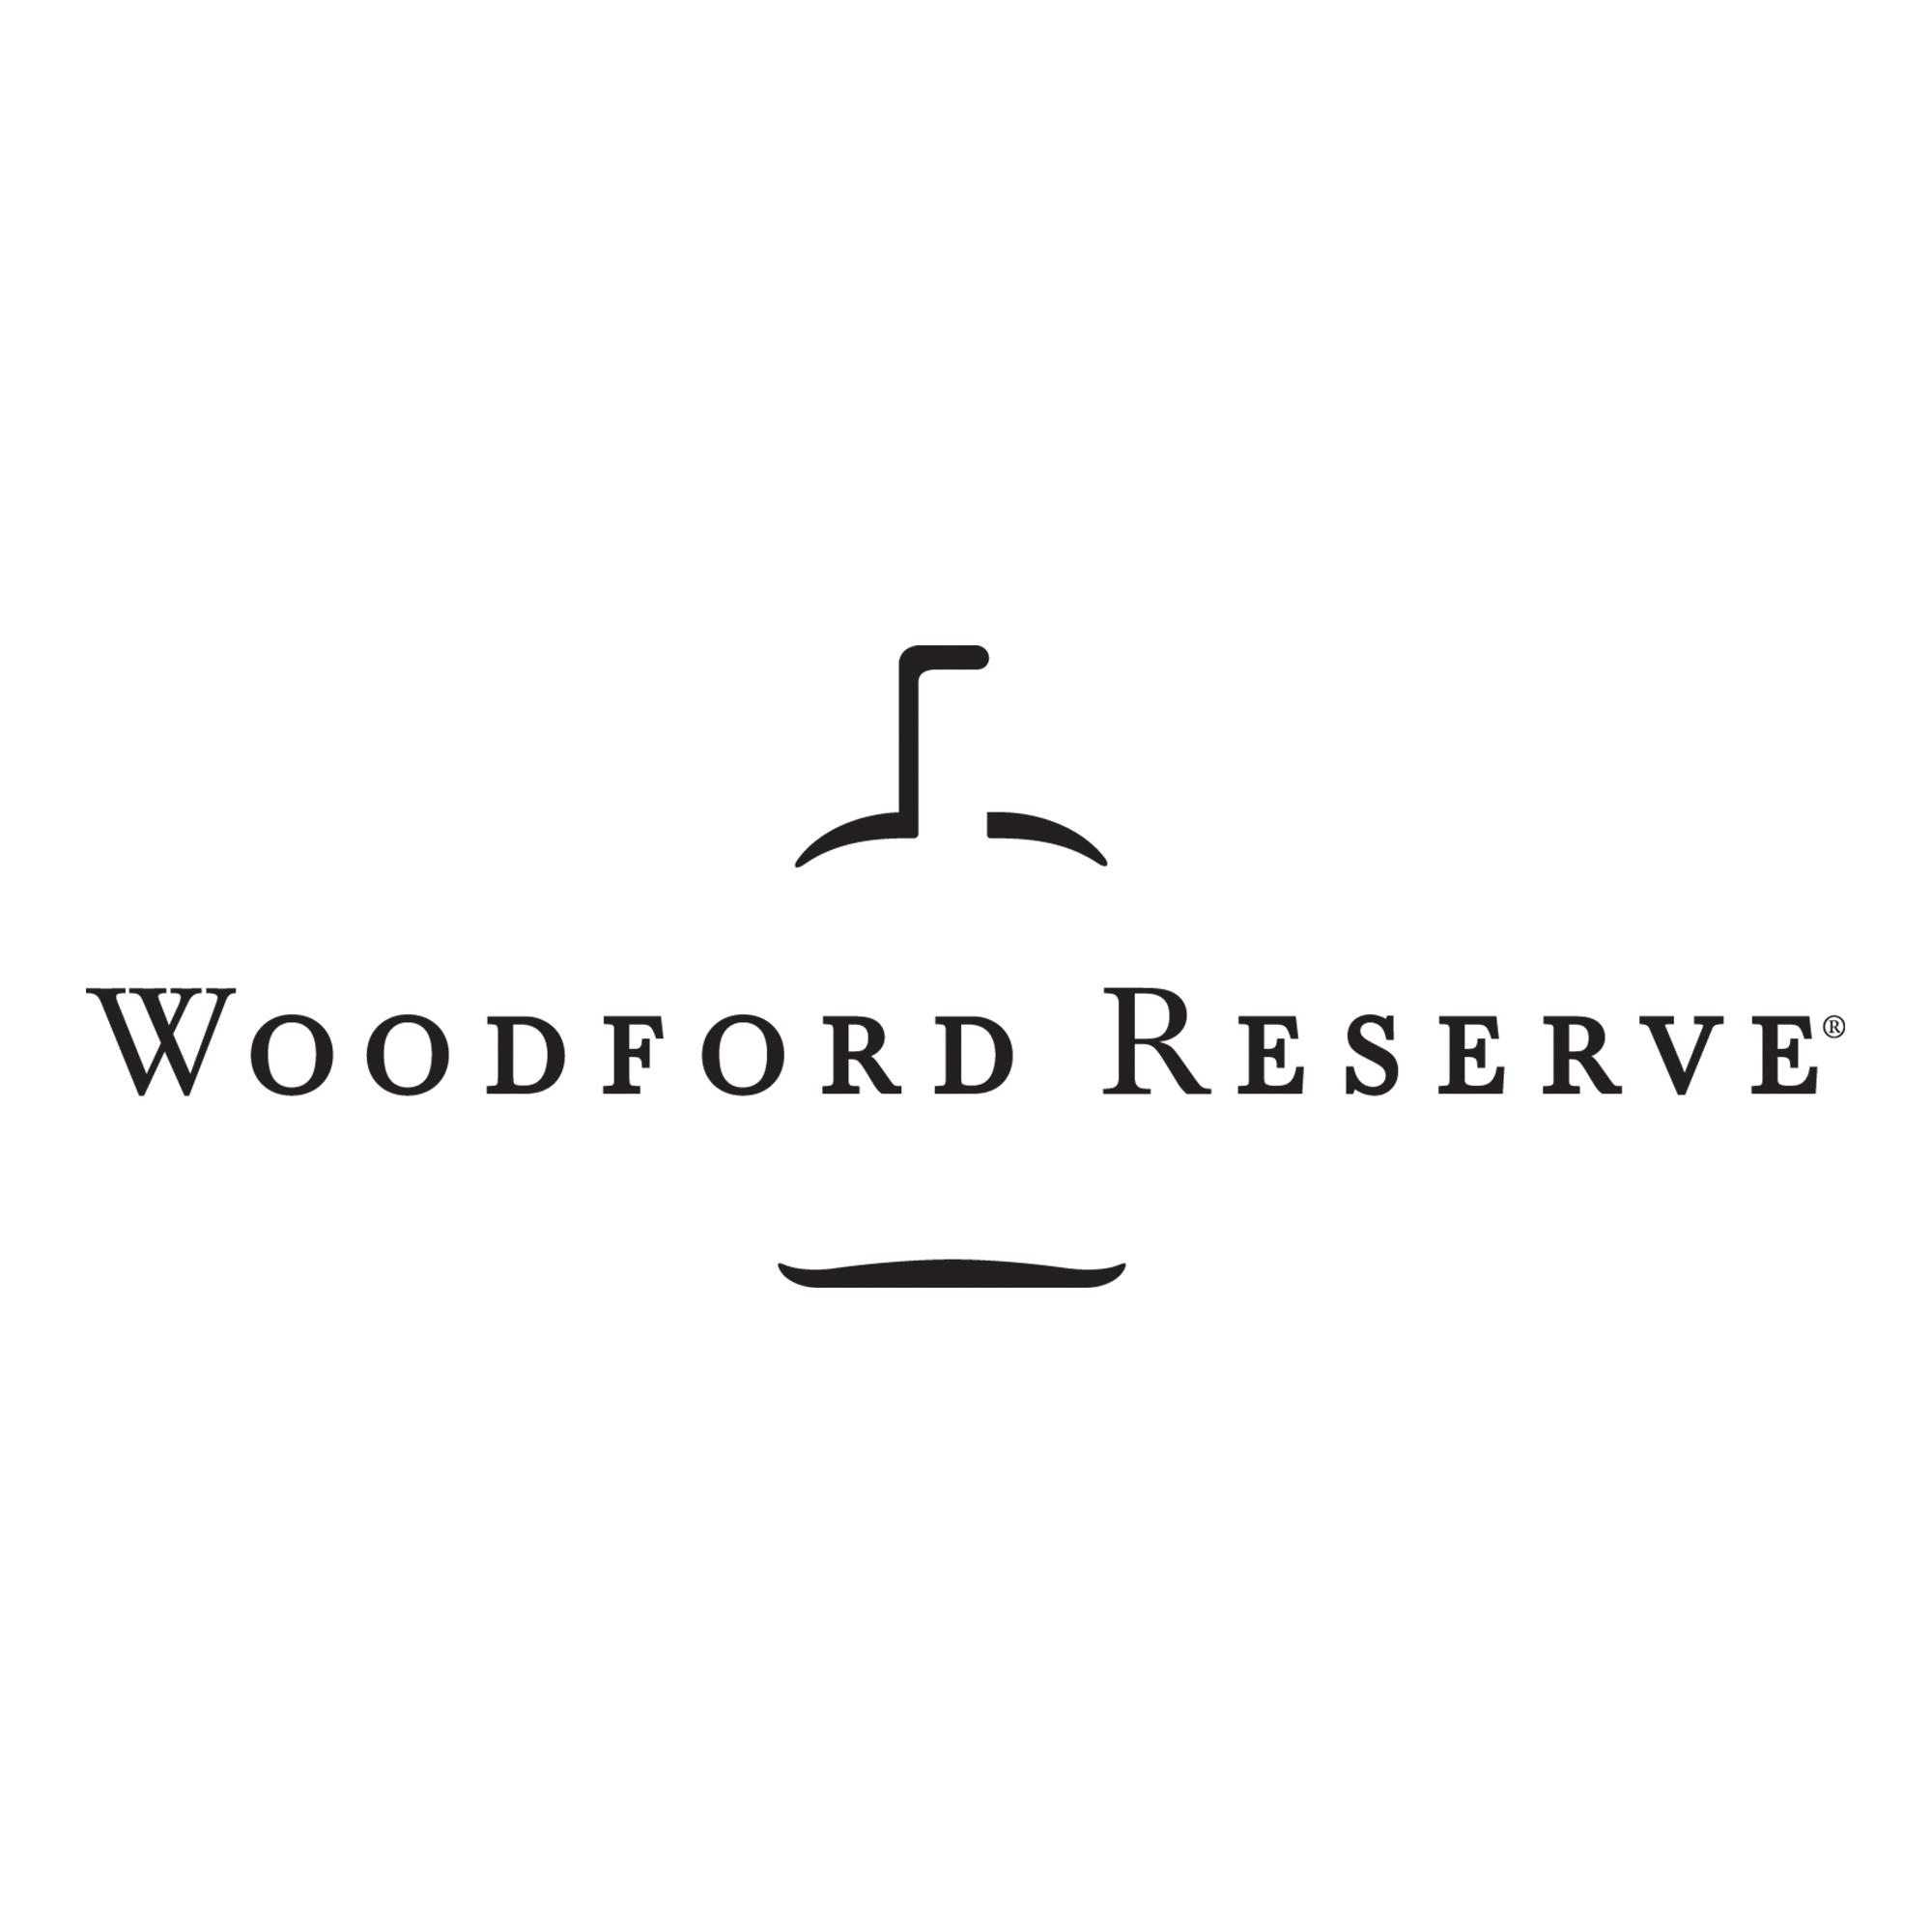 Please enjoy Woodford Reserve responsibly.